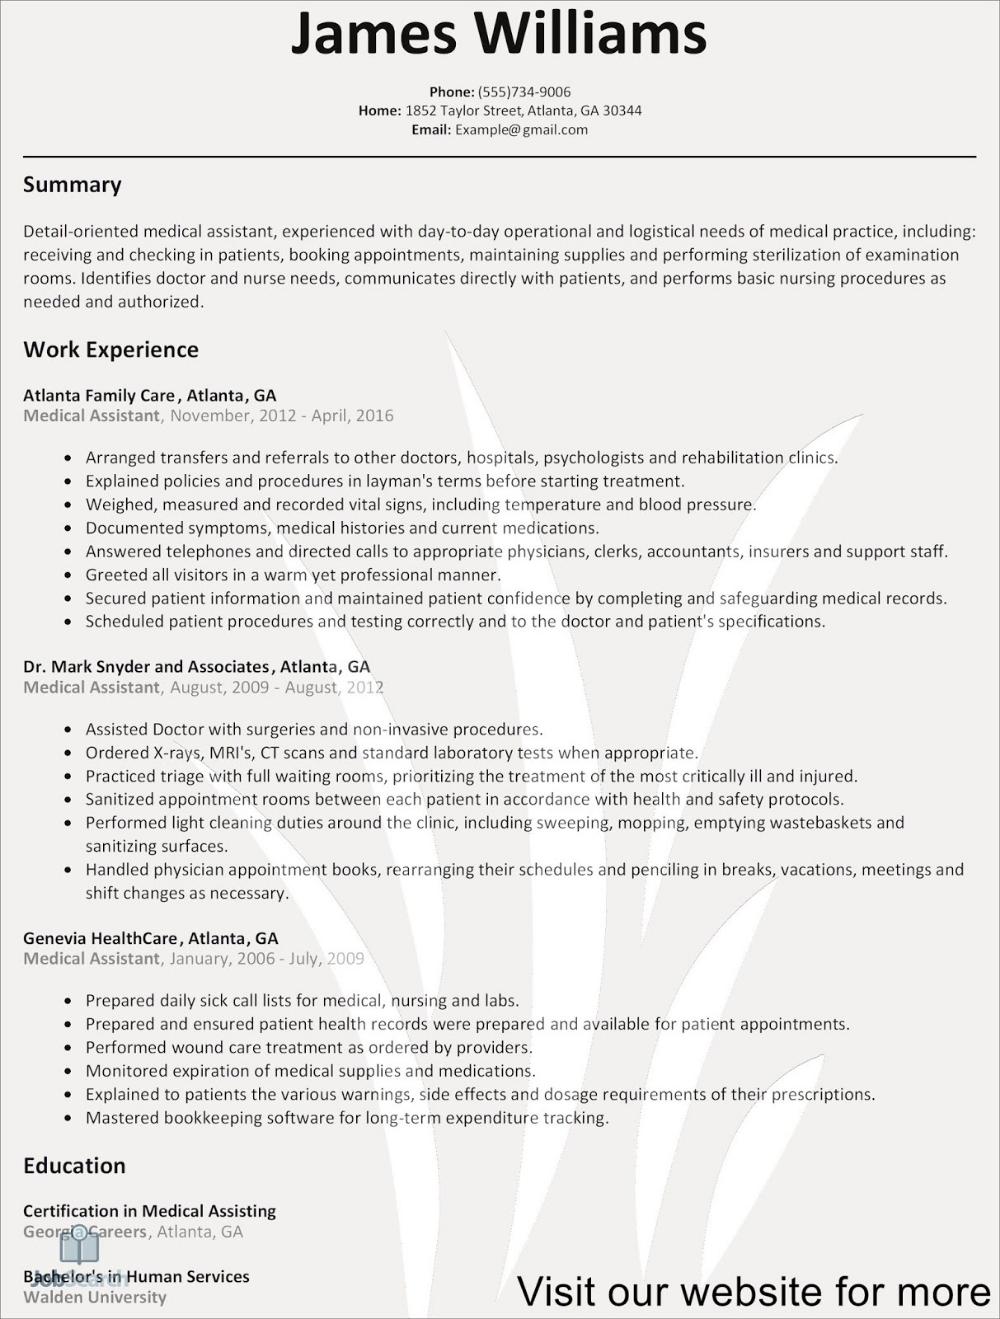 free downloadable resume template microsoft word design